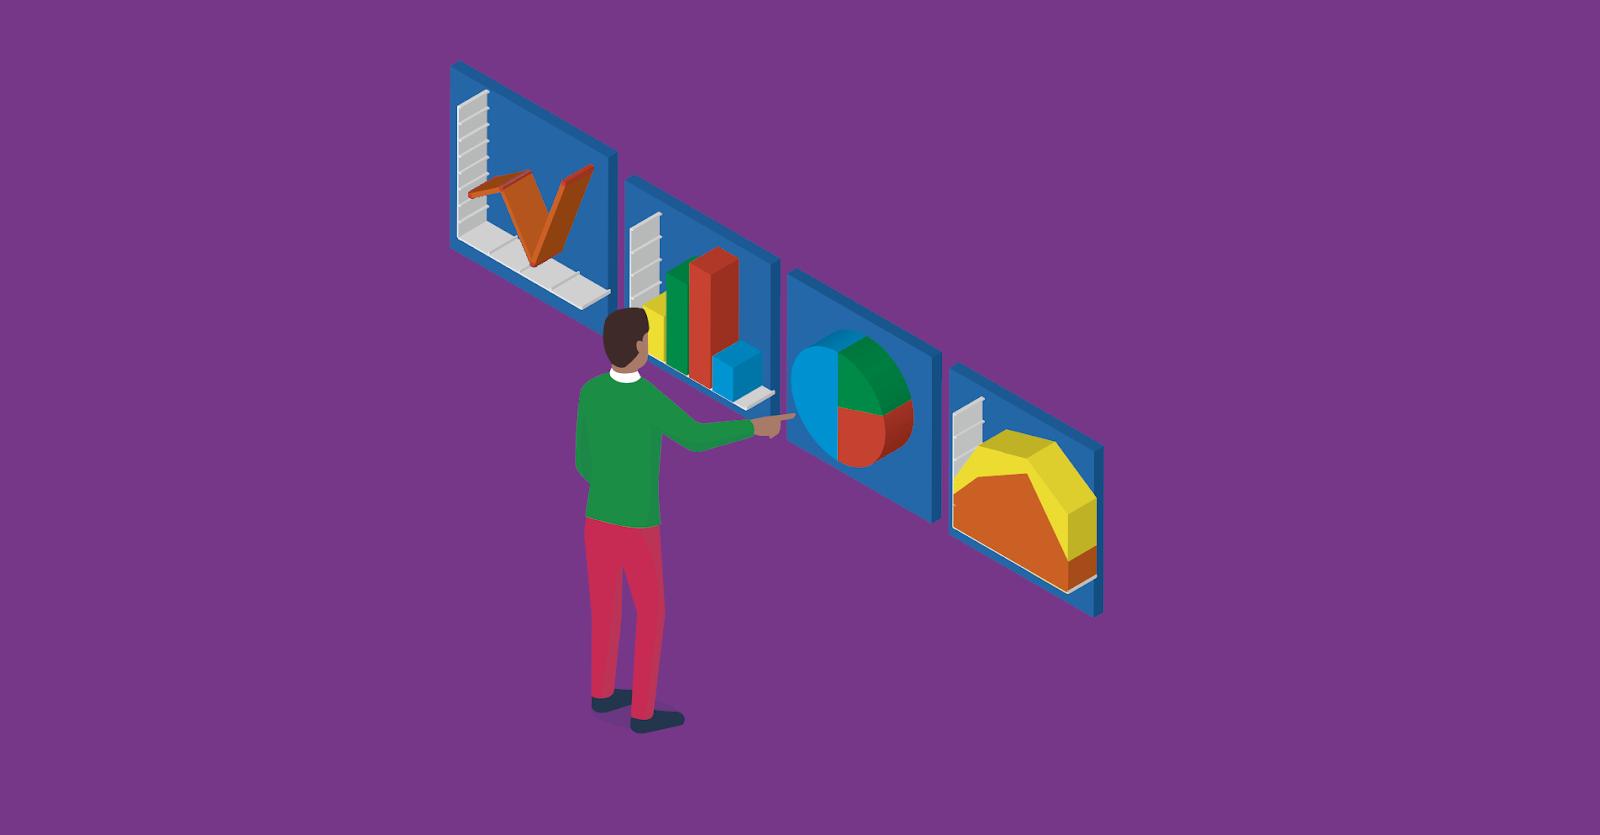 augmentative technologies improve decision making